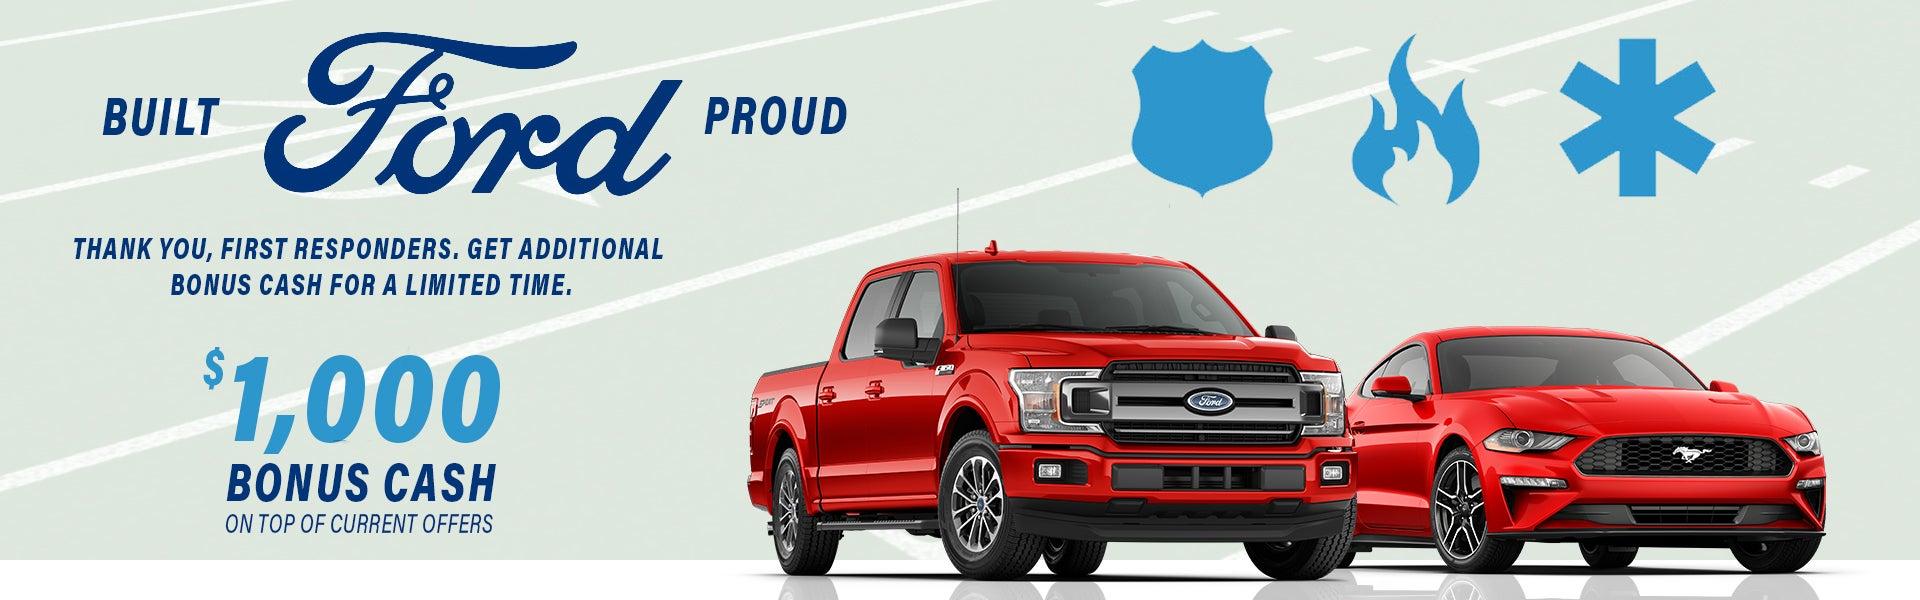 Ford Dealership Greensboro Nc >> Ford Dealer In Kernersville Nc Used Cars Kernersville